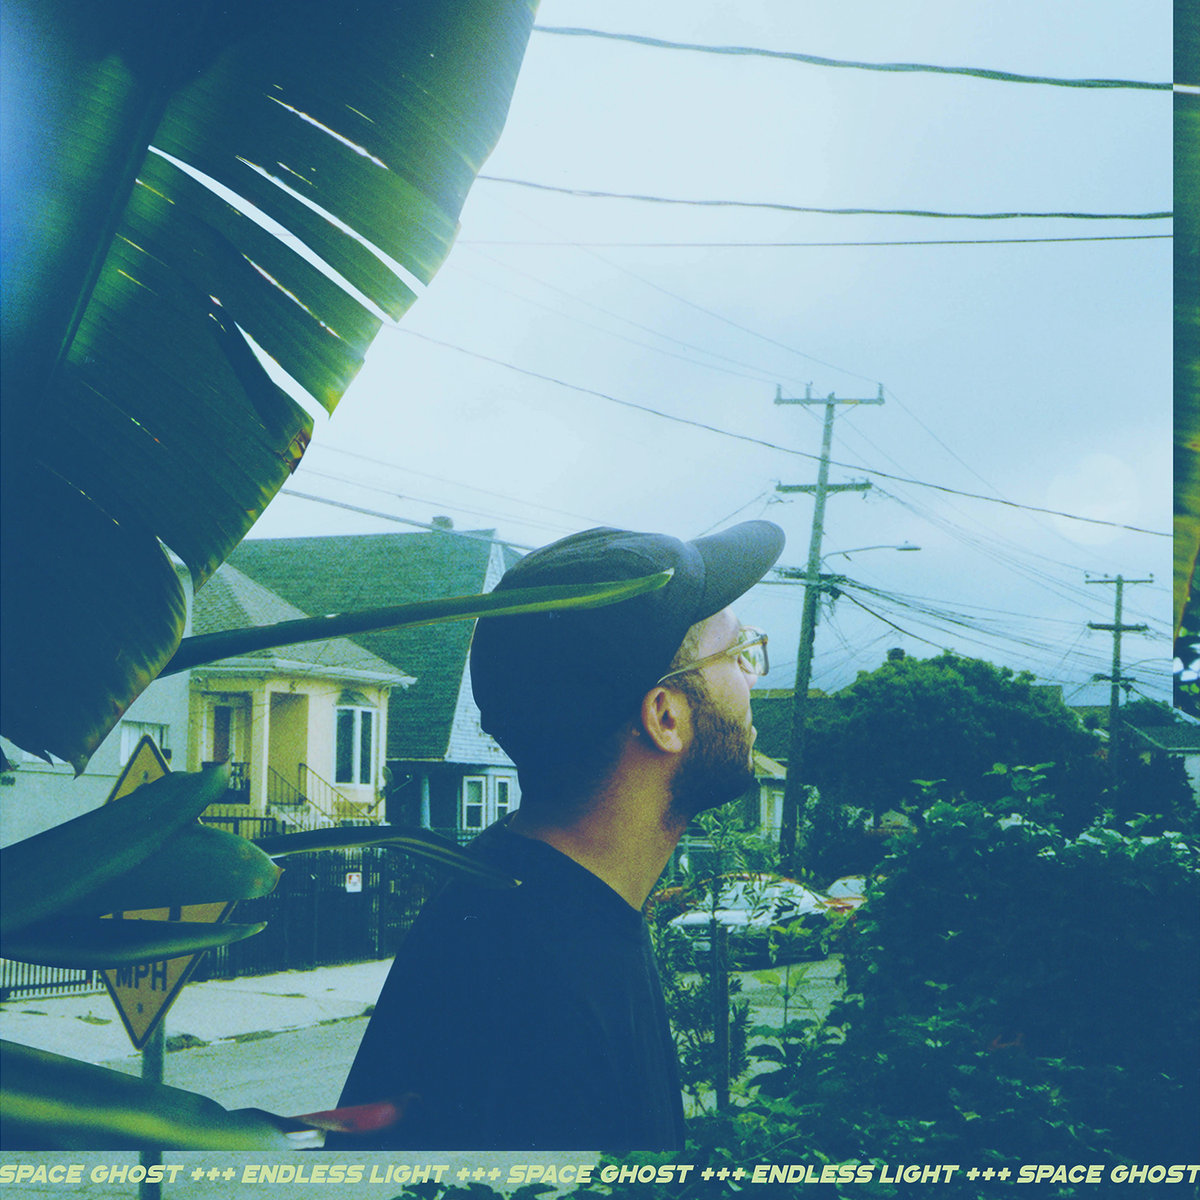 Space Ghost -Endless Light LP - Album Reviews